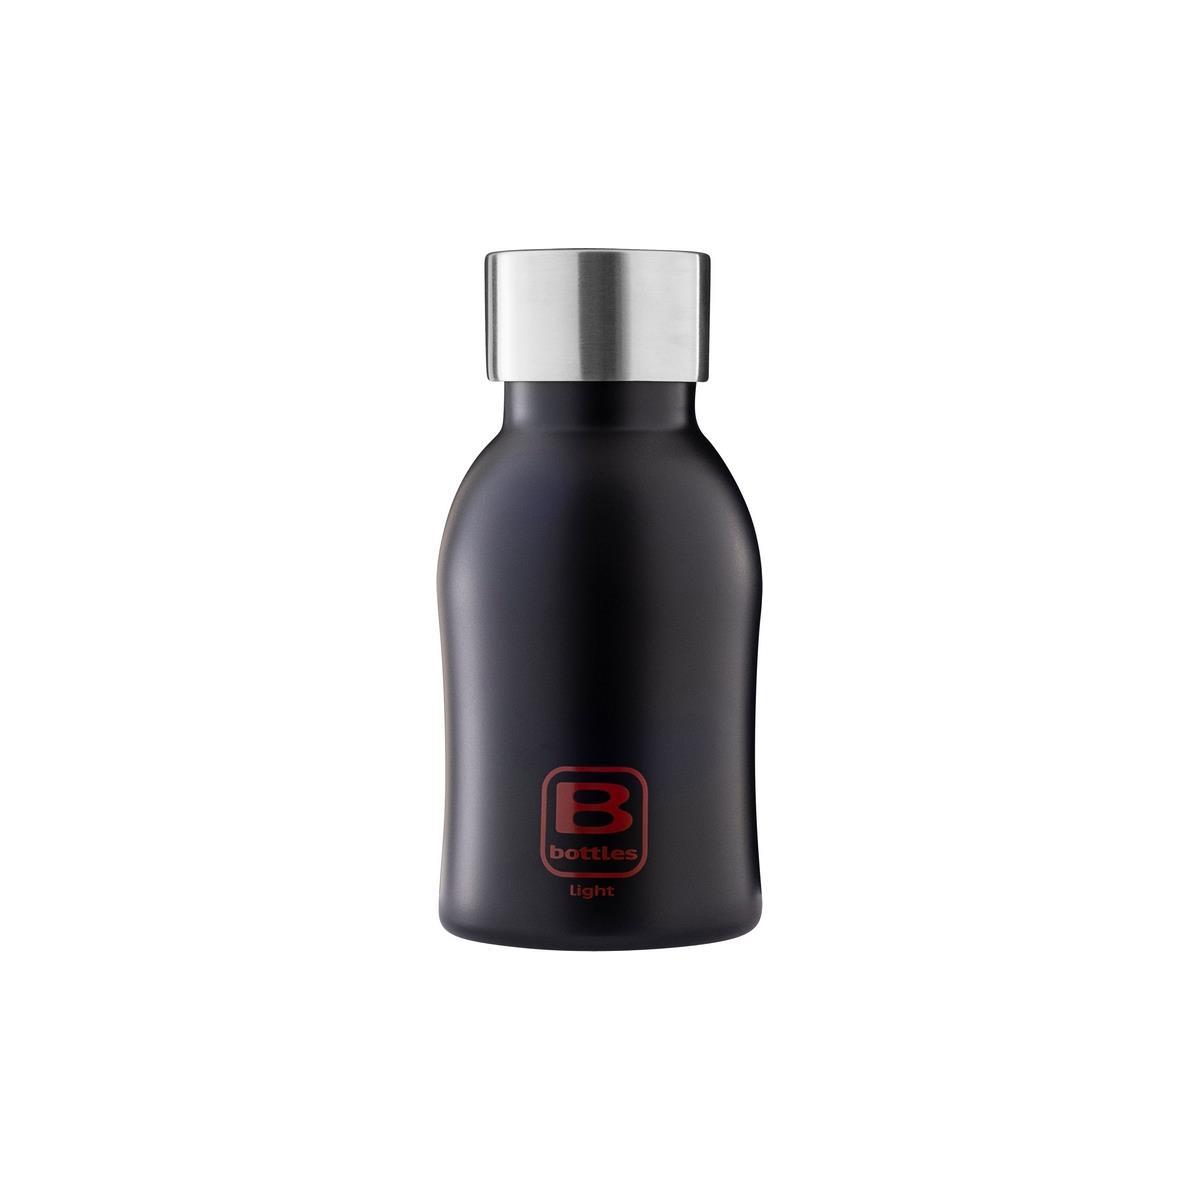 B Bottles Light - Nero Opaco - 350 ml - Bottiglia in acciaio inox 18/10 ultra leggera e compatta